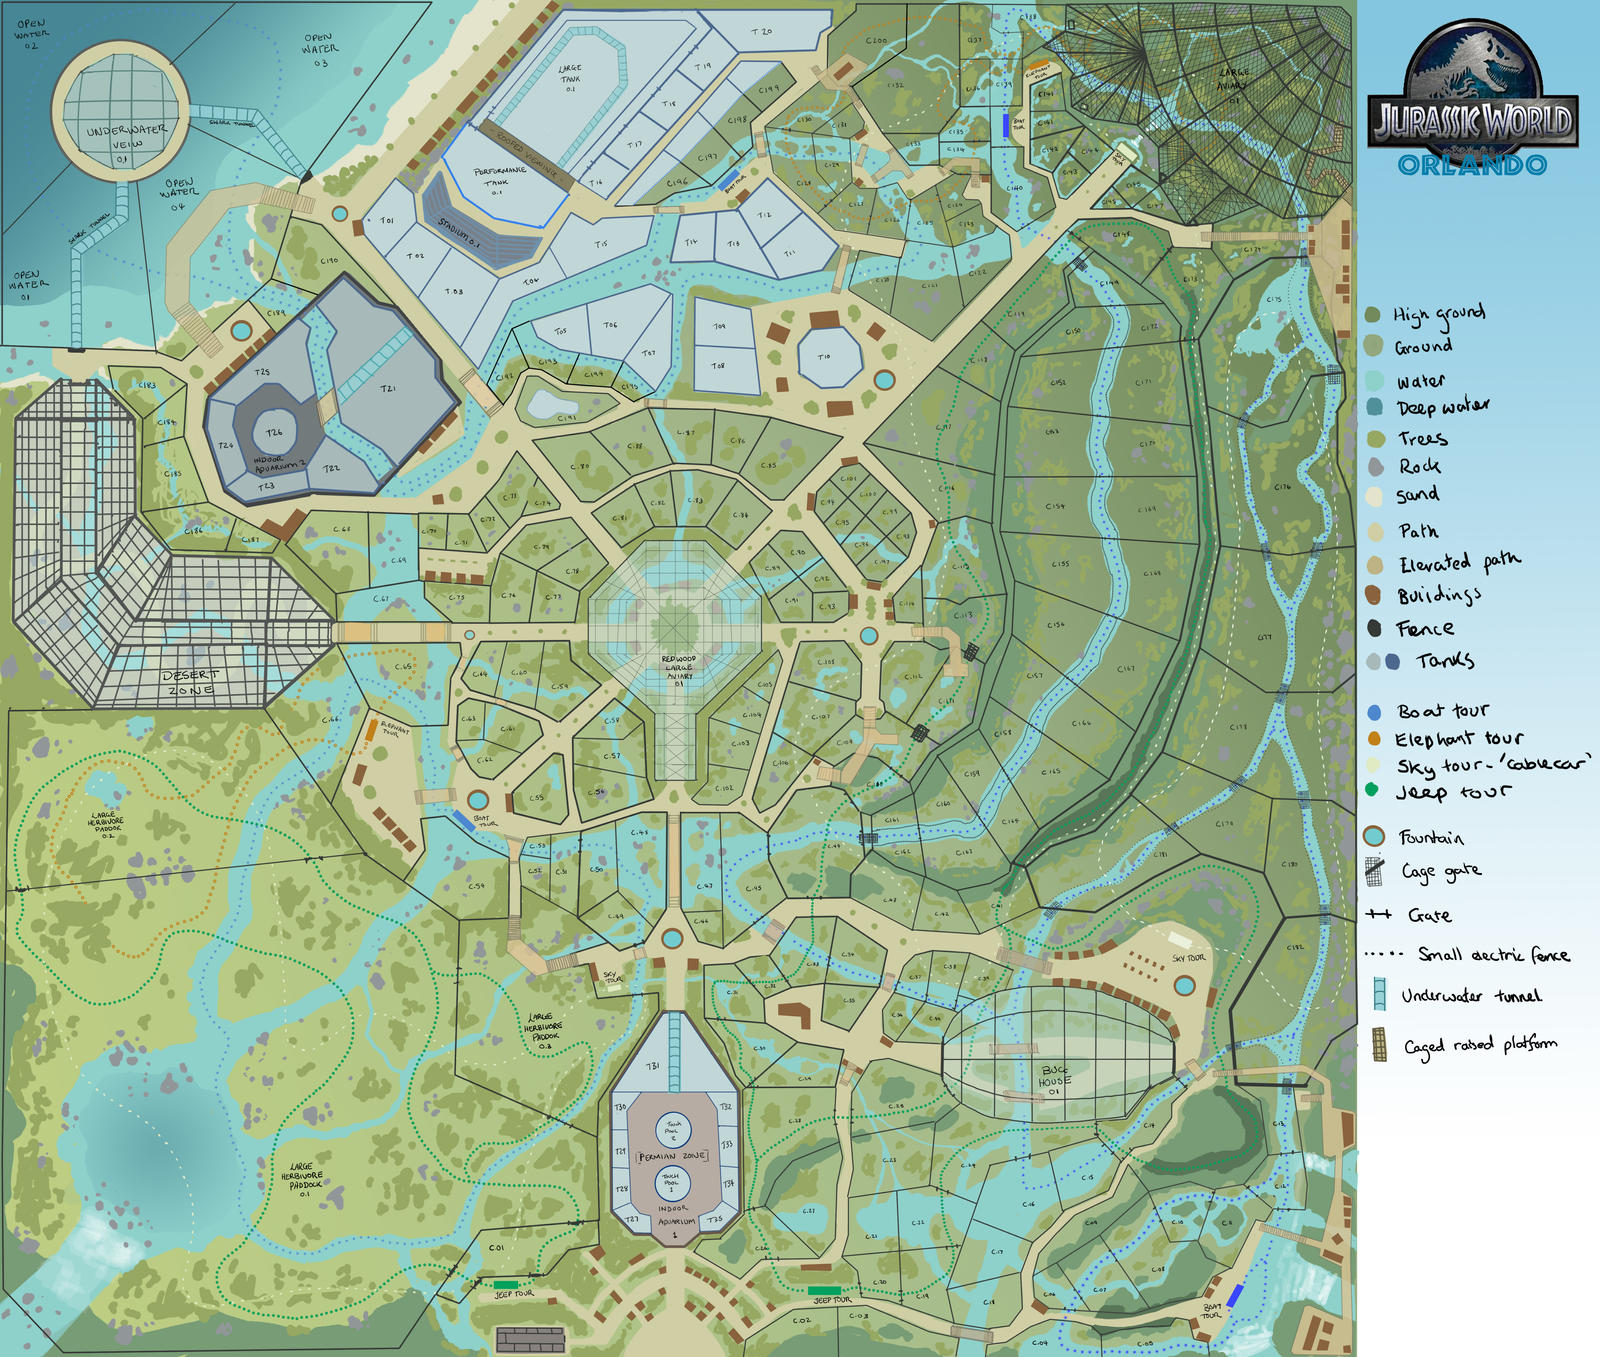 Jurassic world orlando map by joshuadunlop on deviantart jurassic world orlando map by joshuadunlop jurassic world orlando map by joshuadunlop gumiabroncs Choice Image